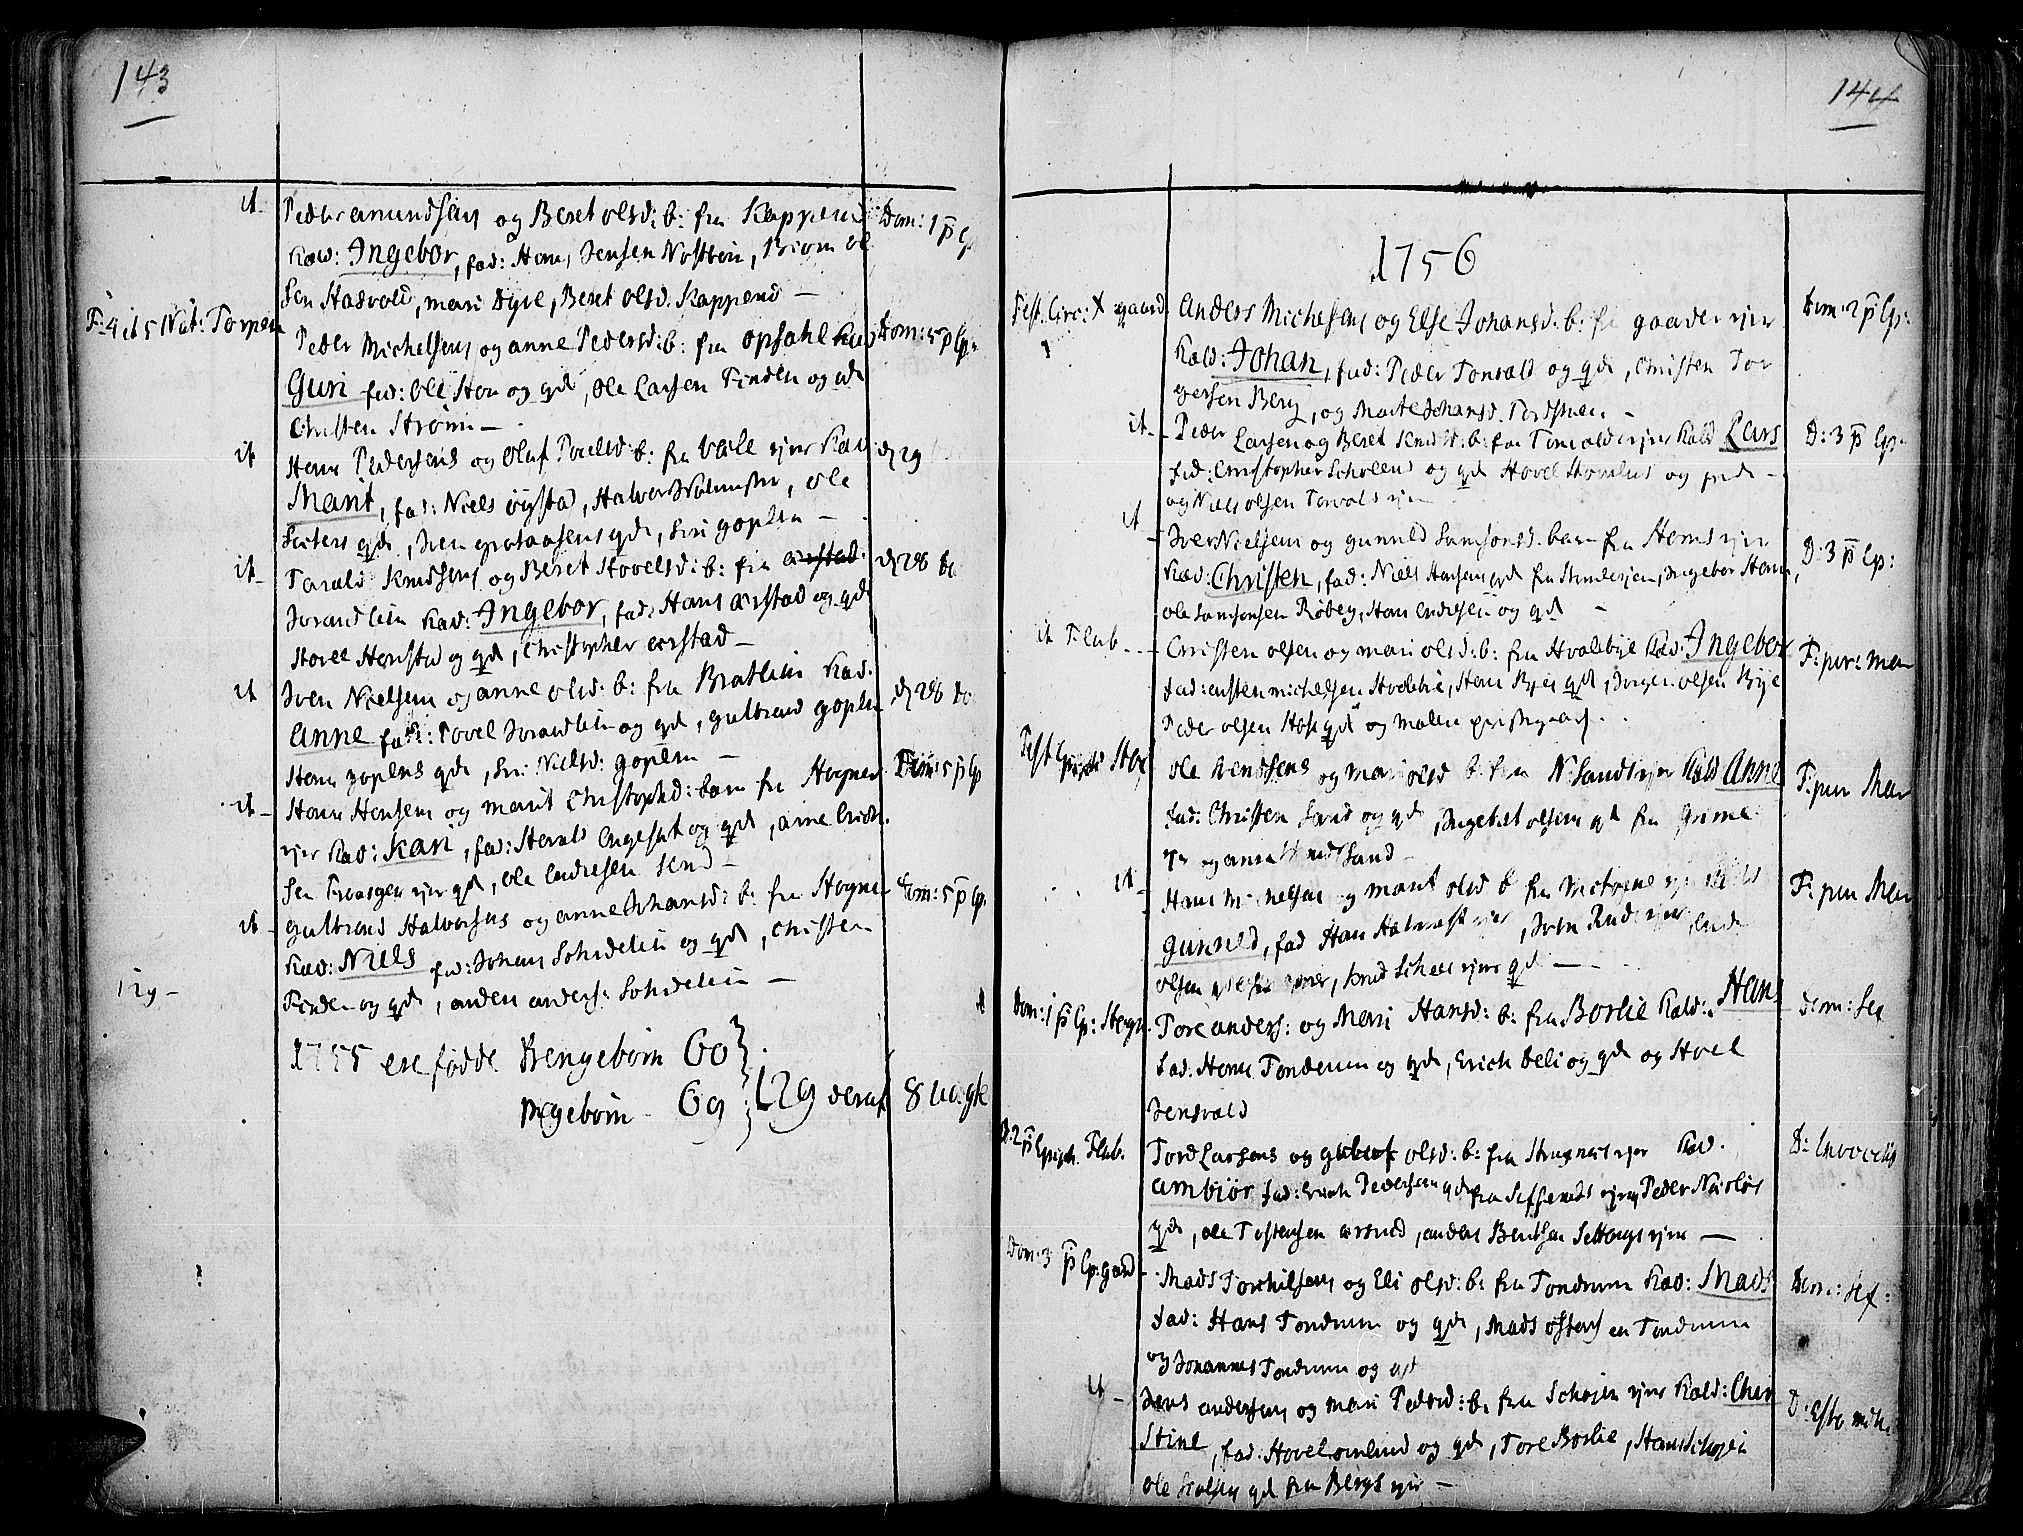 SAH, Land prestekontor, Ministerialbok nr. 2, 1733-1764, s. 143-144